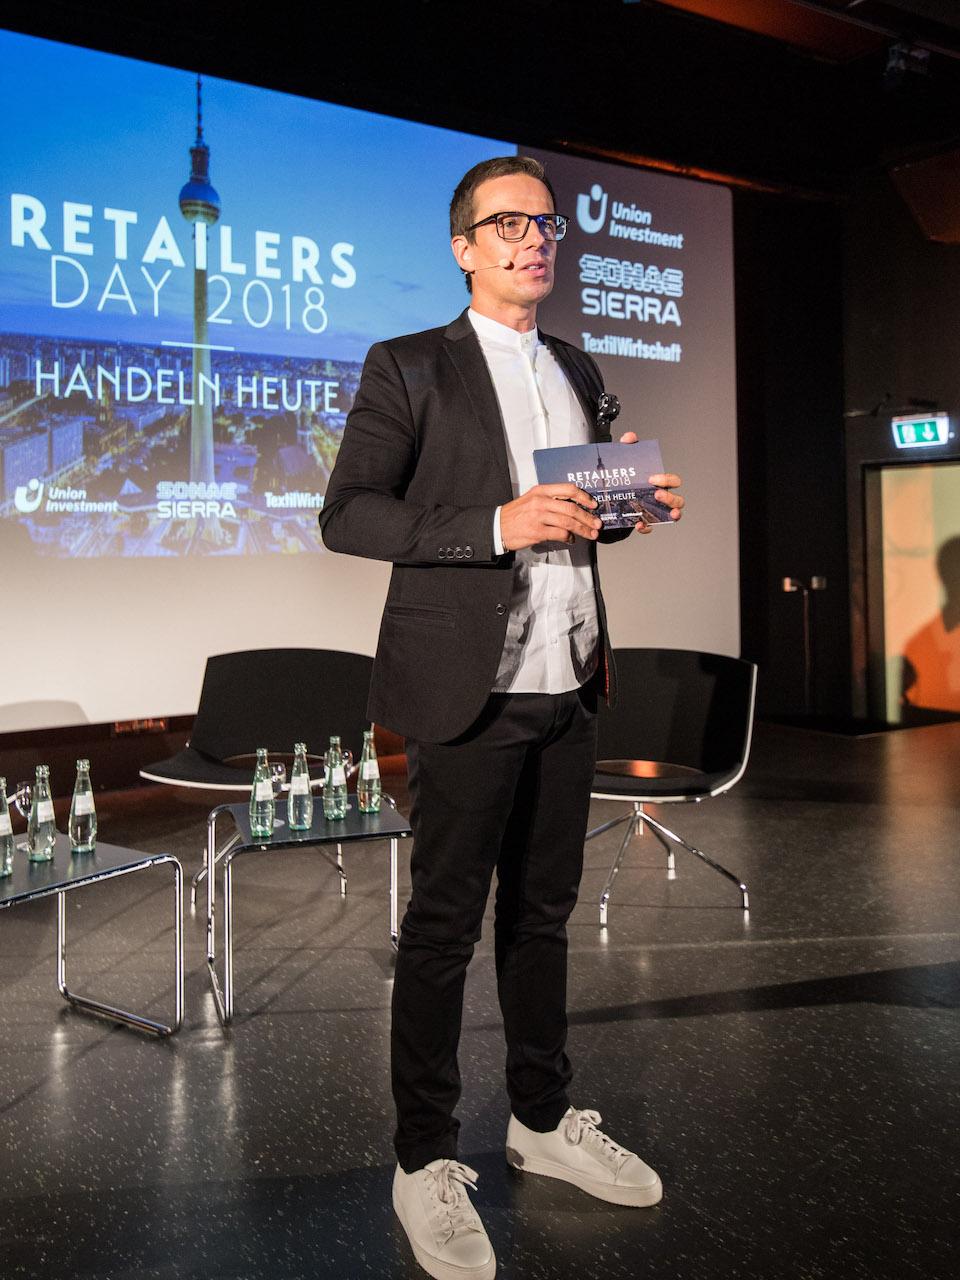 10_Harald_Greising_Moderator_Retailersday_Berlin_2018.jpg